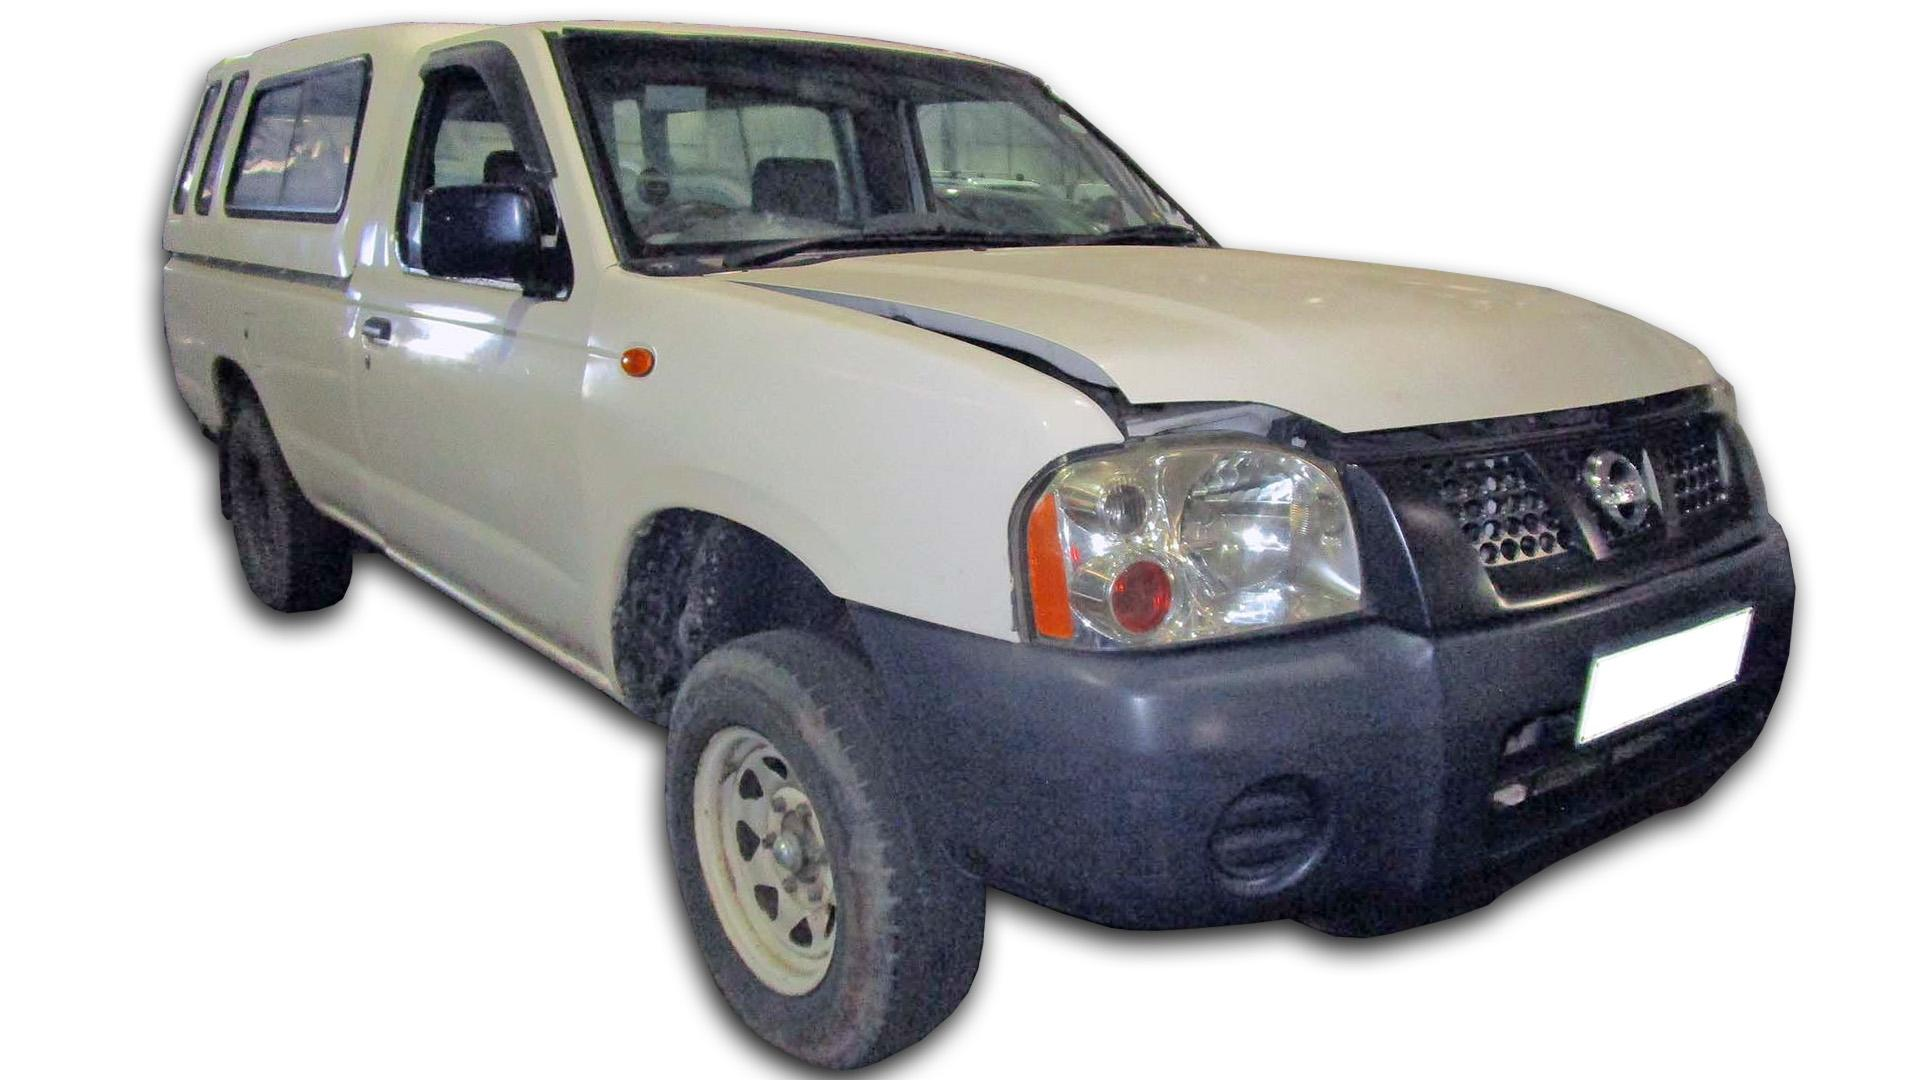 Nissan Hardbody NP300 2.0 I